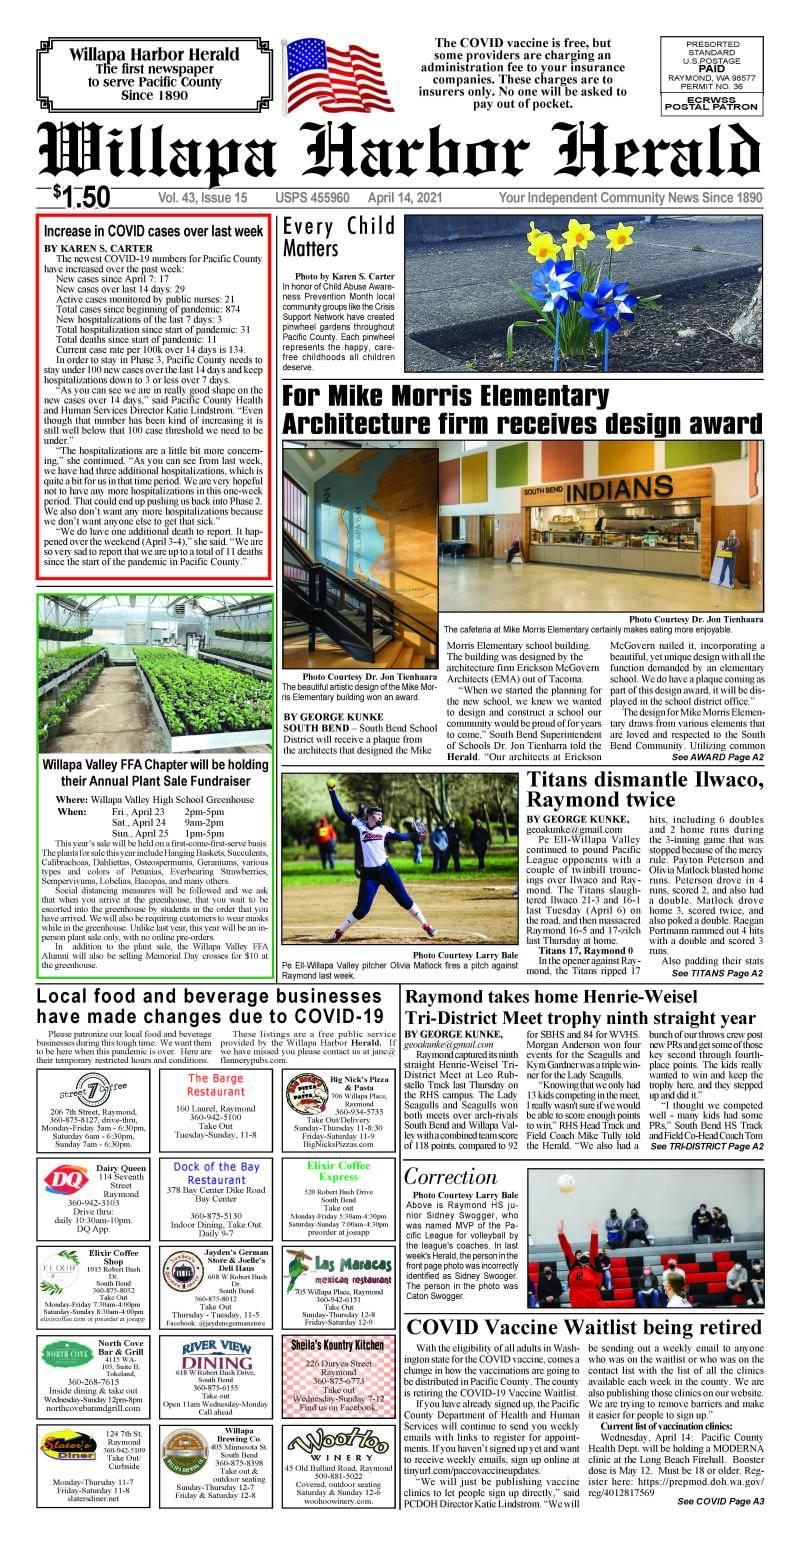 April 14, 2021 Willapa Harbor Herald and Pacific County Press